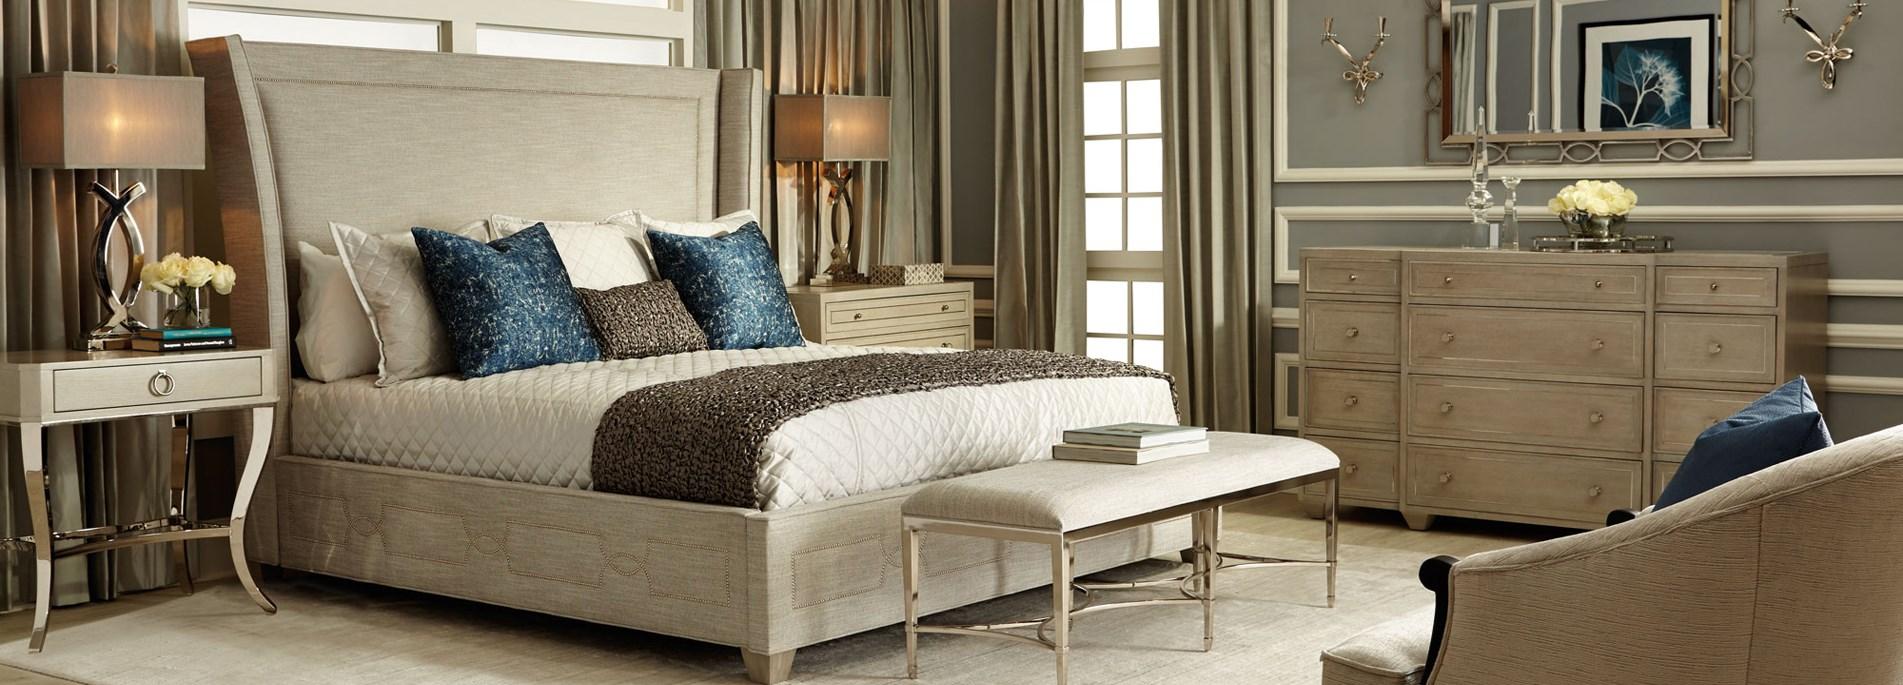 Florida's Premier Bedroom Furniture Store